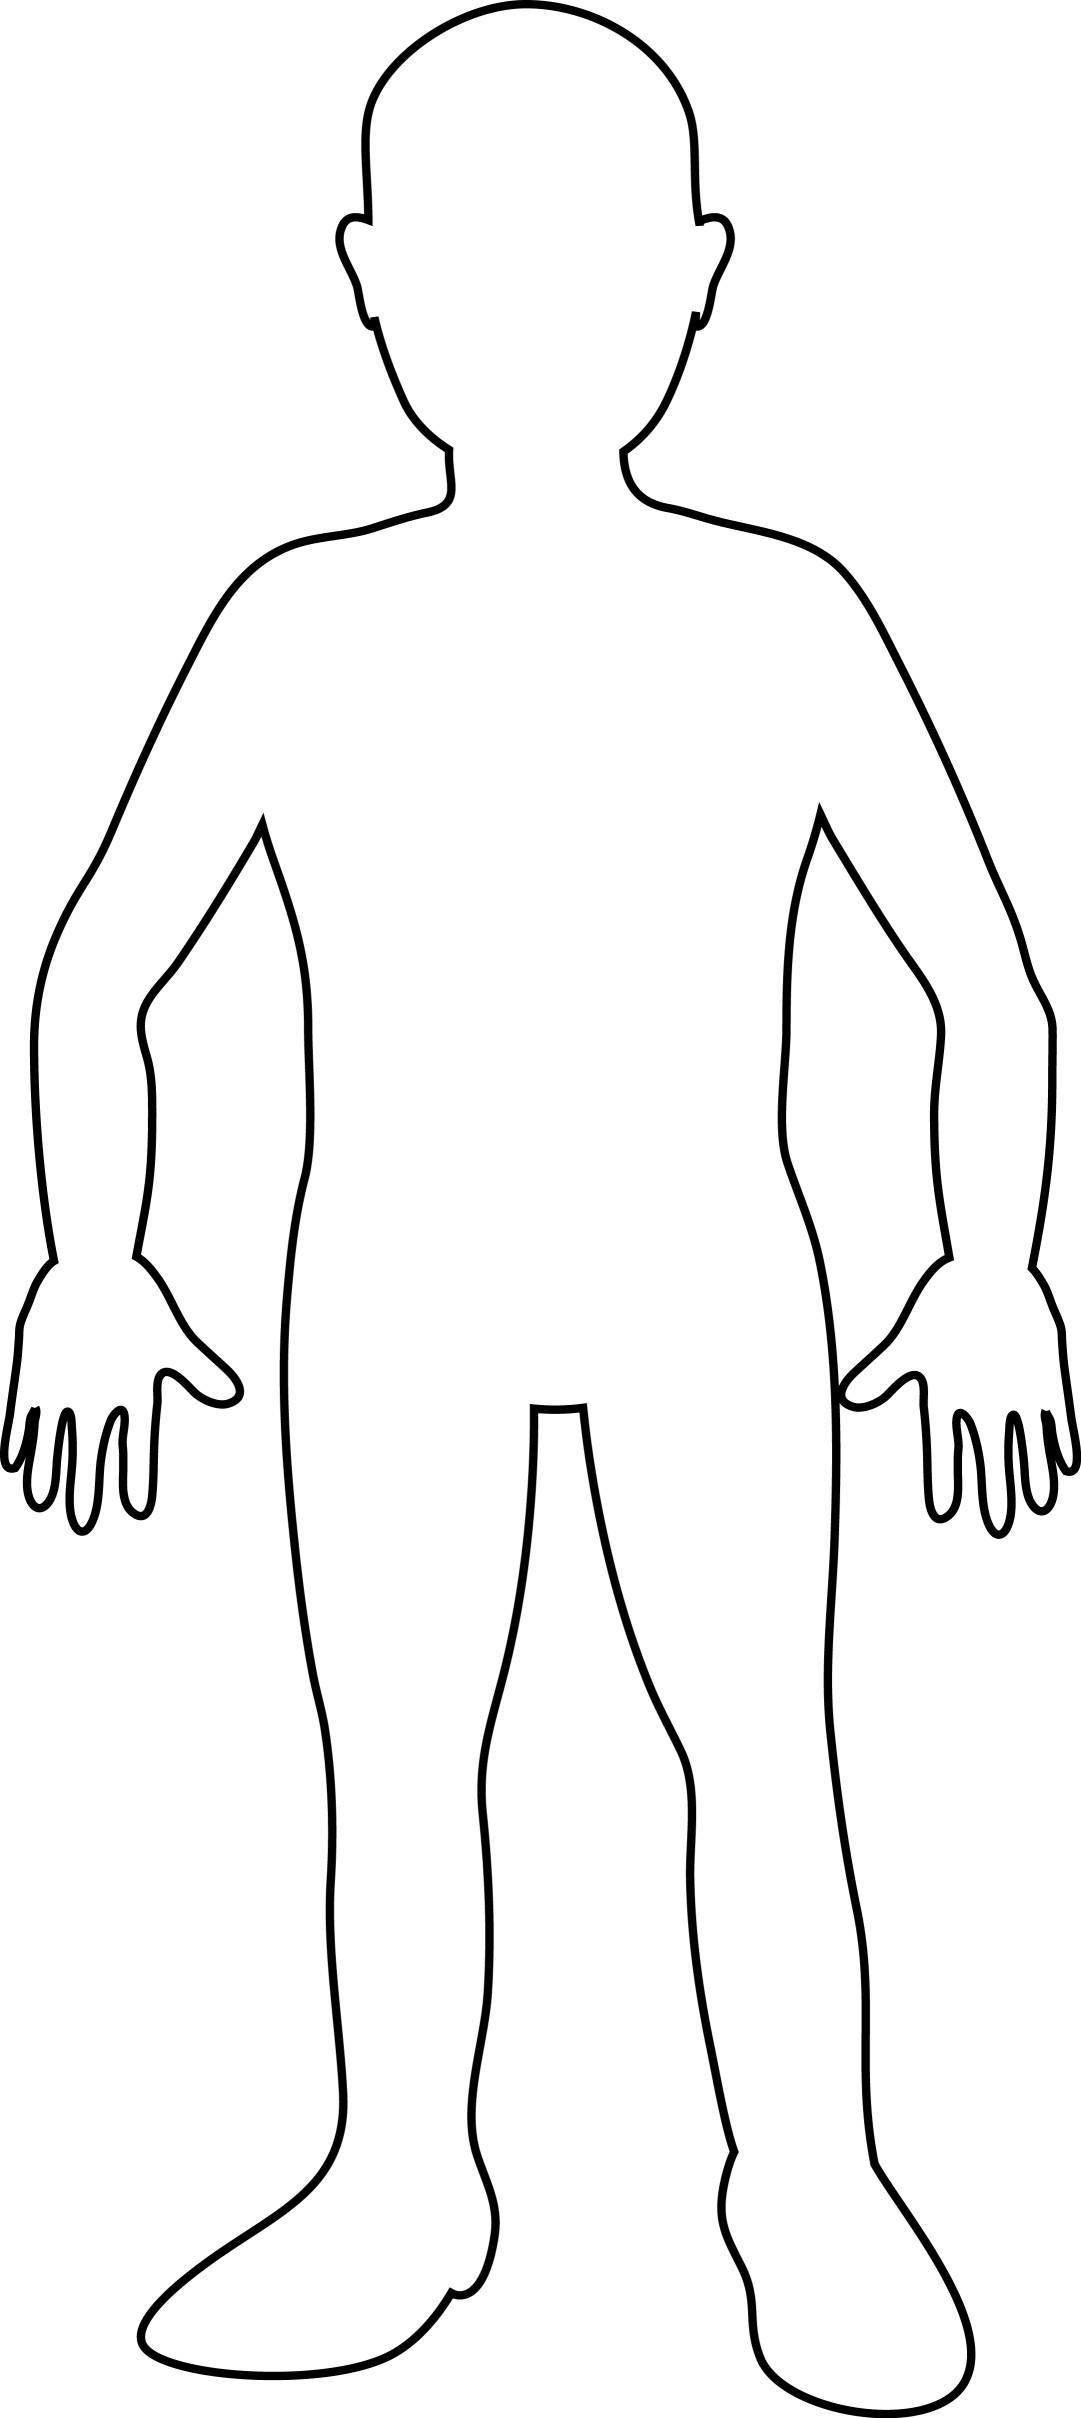 blank human body clipart